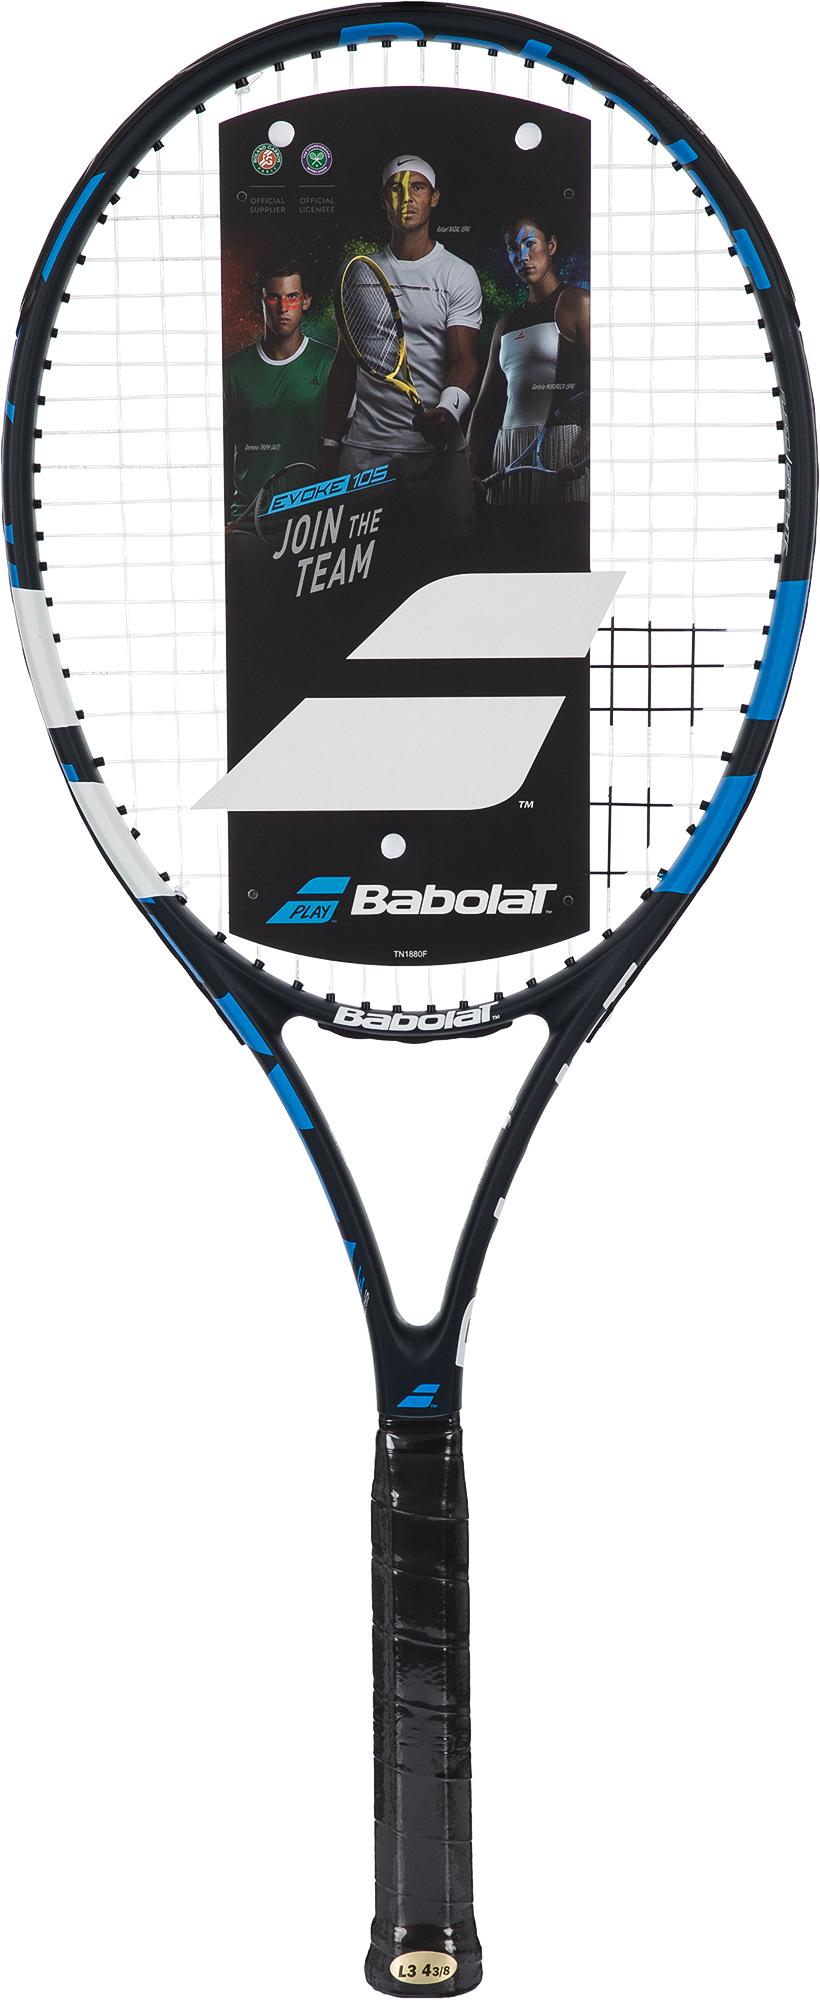 Babolat Ракетка для большого тенниса EVOKE 105 27